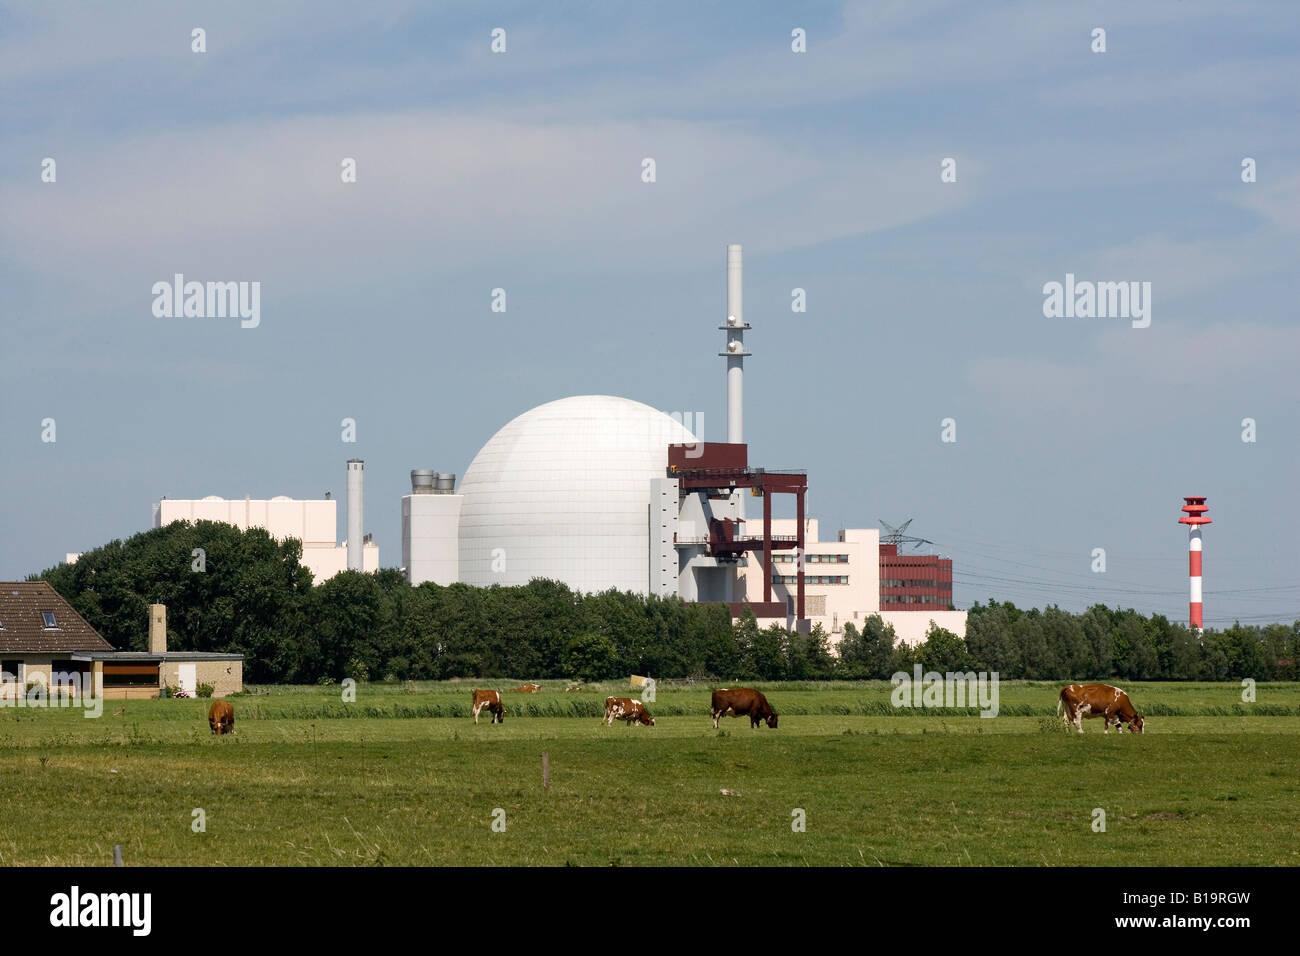 The atomic power plant in Brokdorf - Stock Image